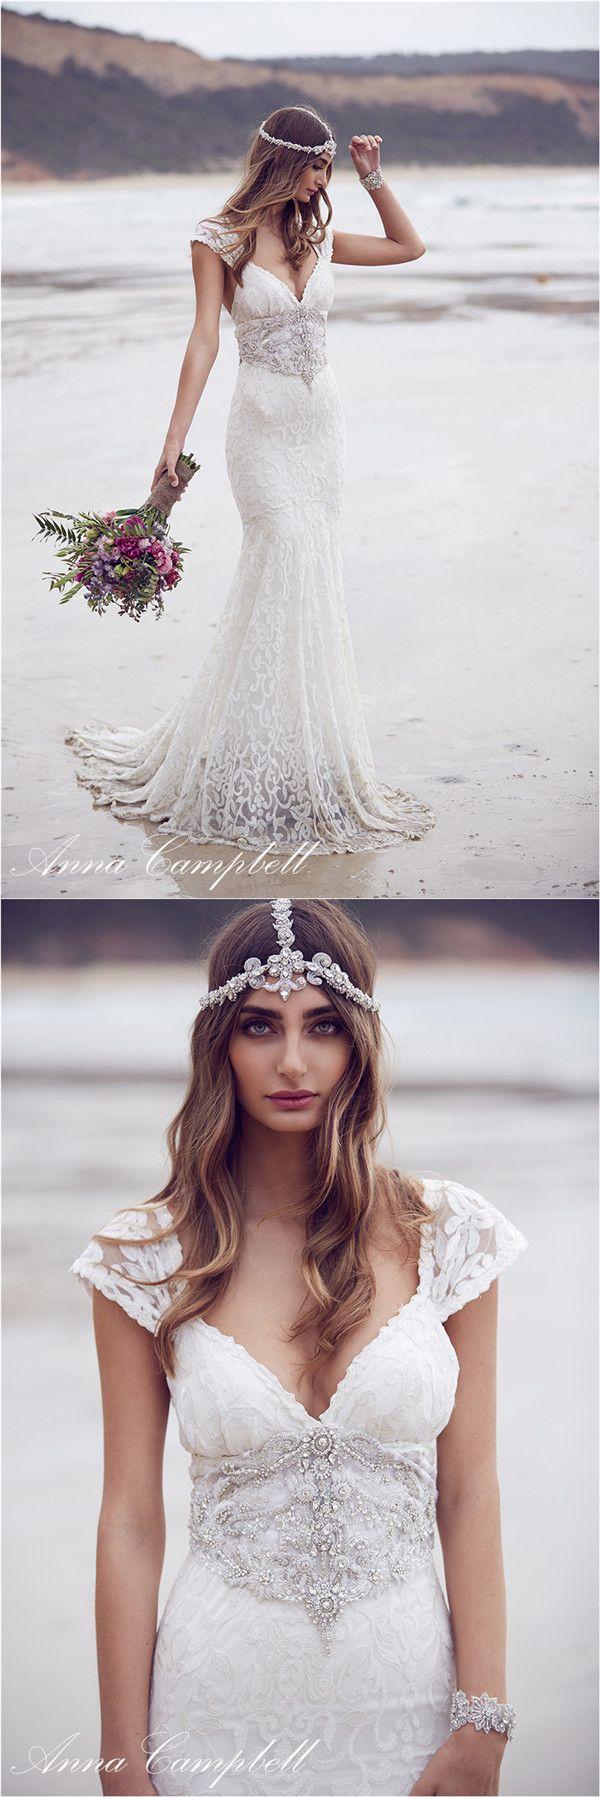 26 best wedding dresses 2016 images on Pinterest | Engagements ...